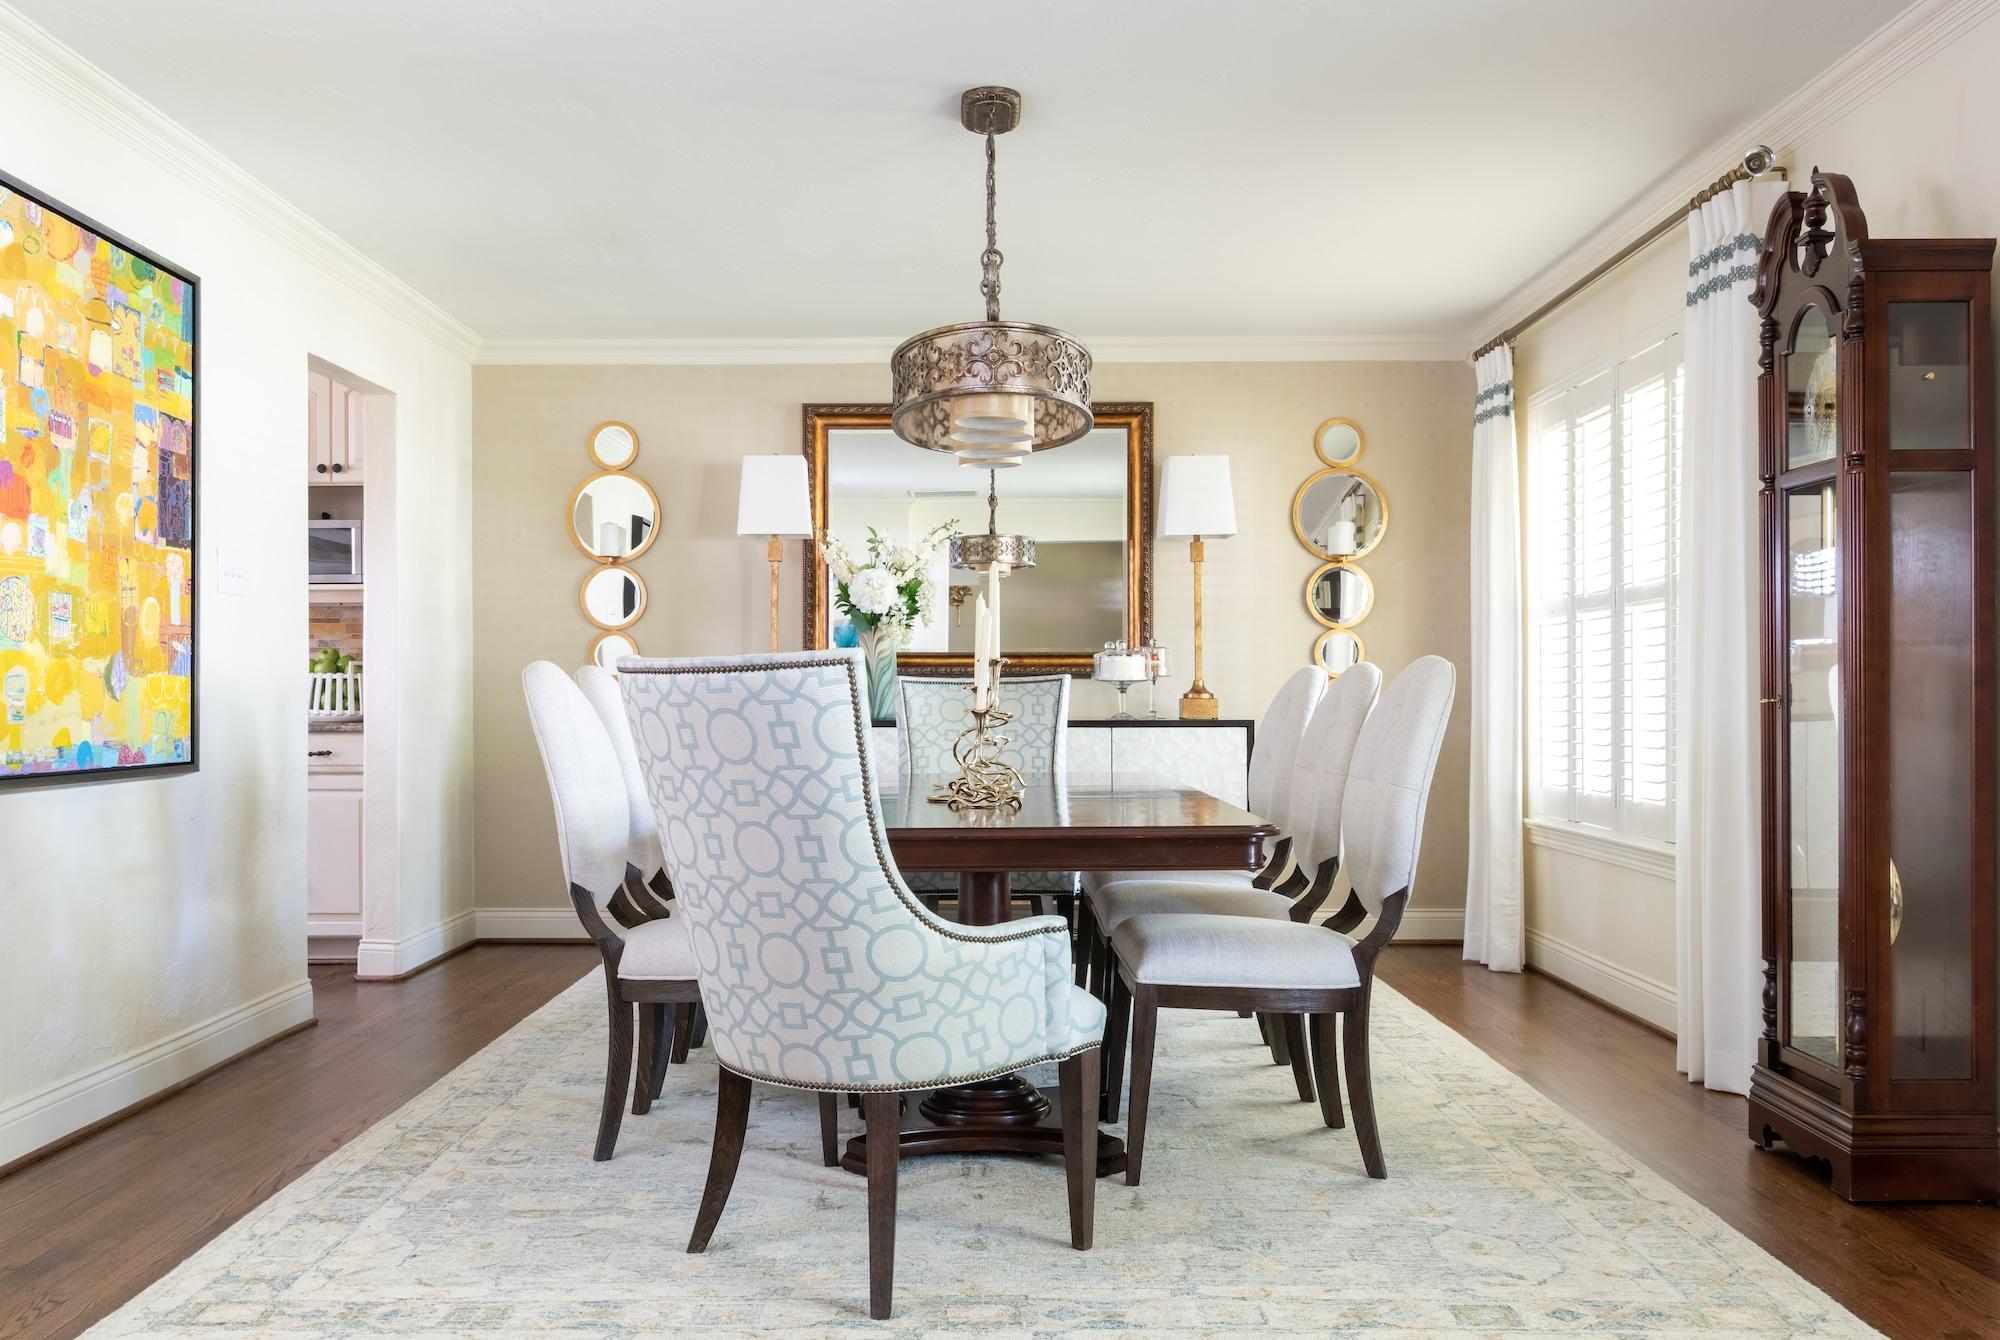 Transitional-Modern-Dining-Room-Design-Trends-2020-Furniture-Art-Deco